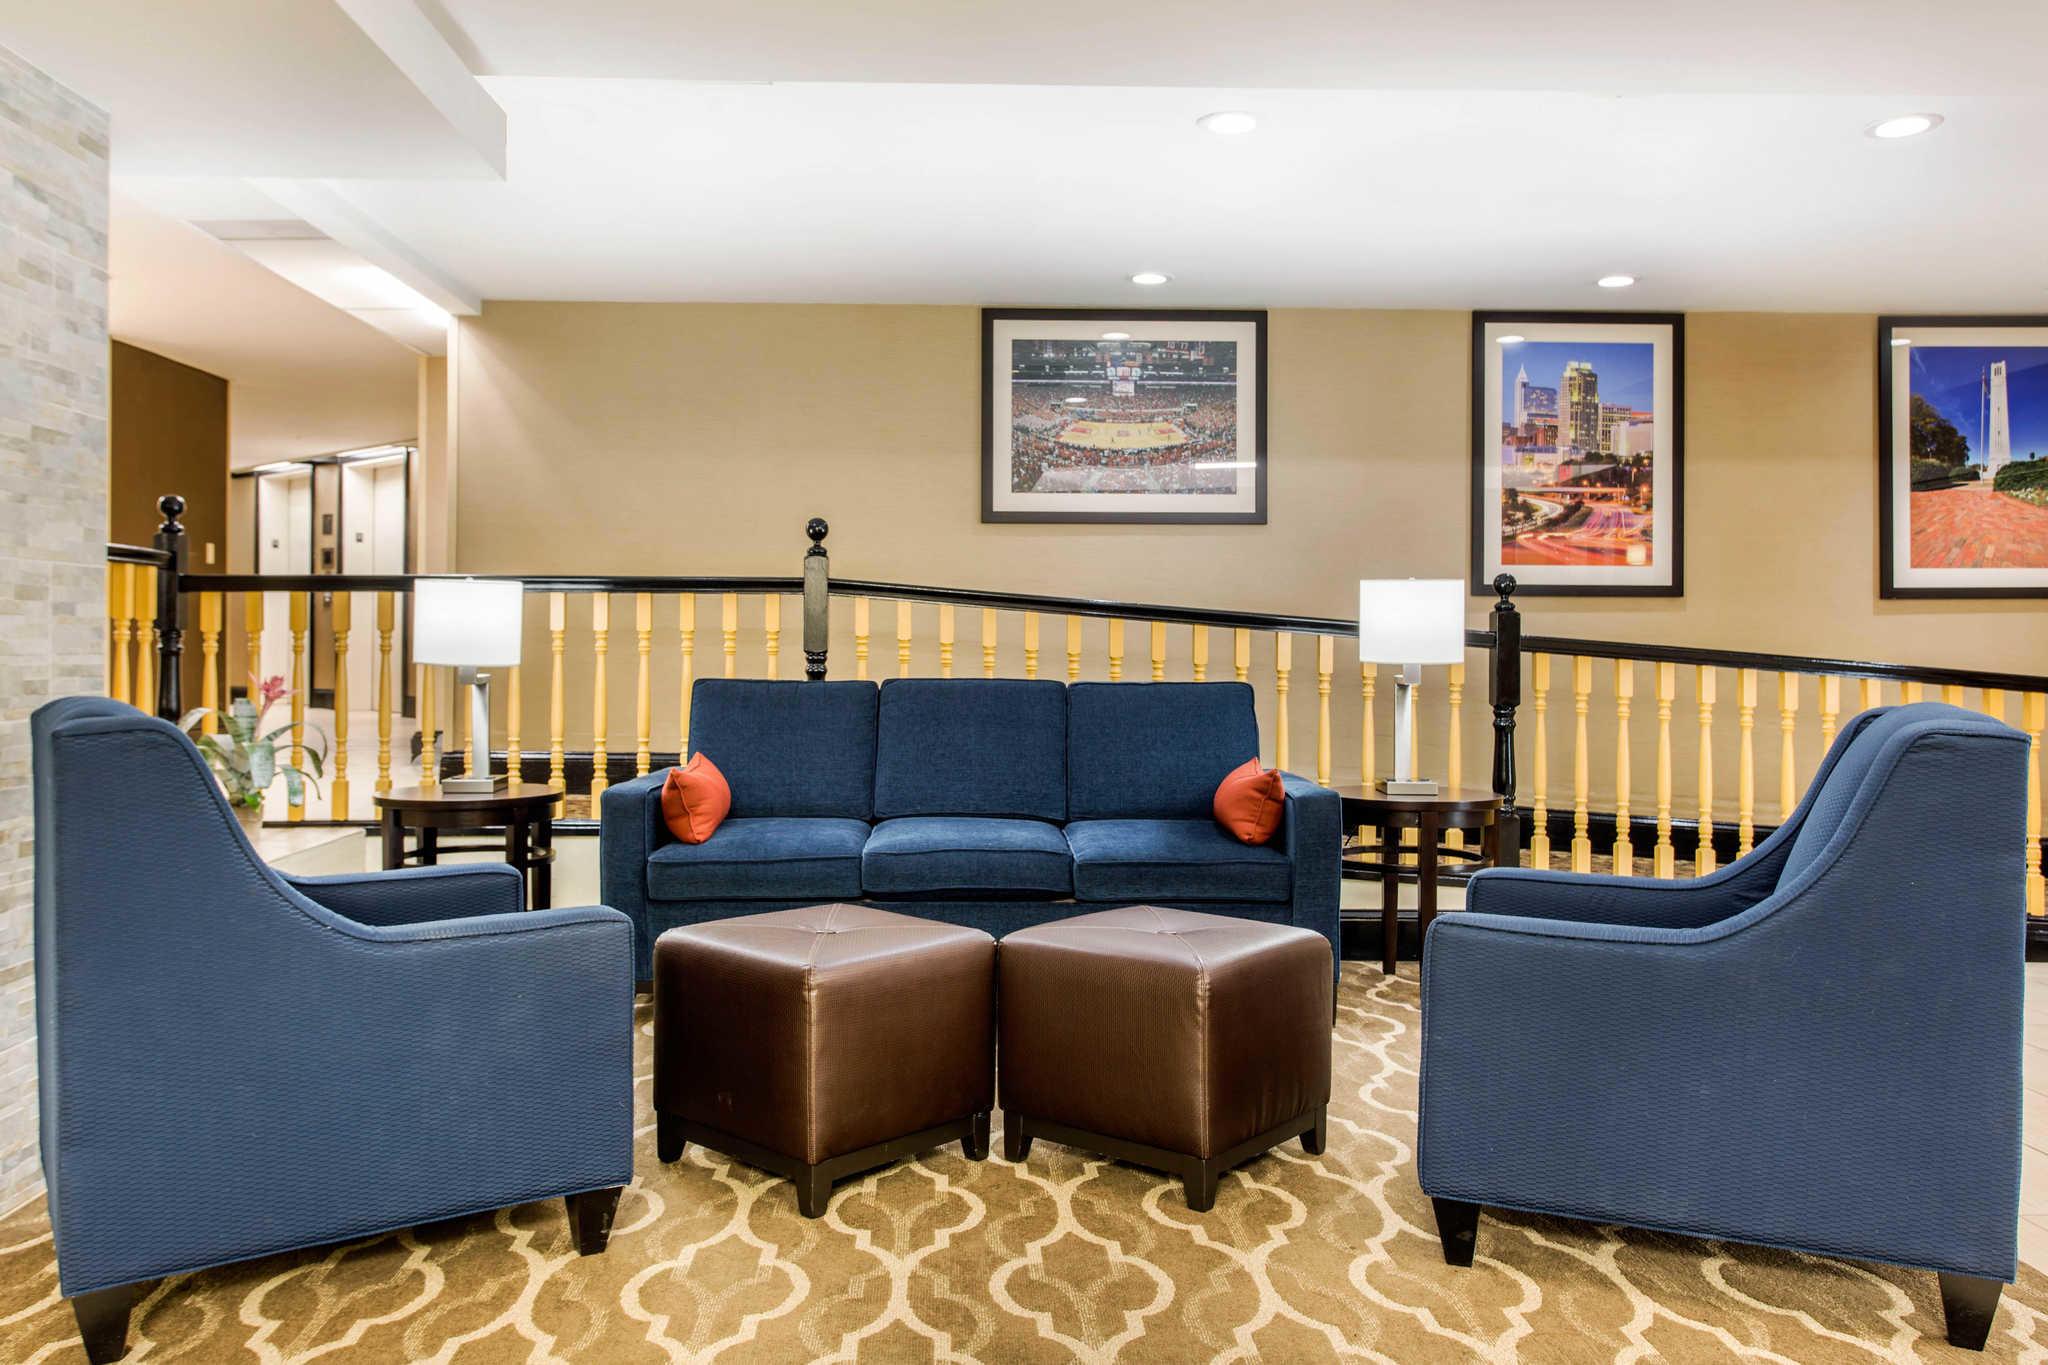 Comfort Inn & Suites Crabtree Valley image 2